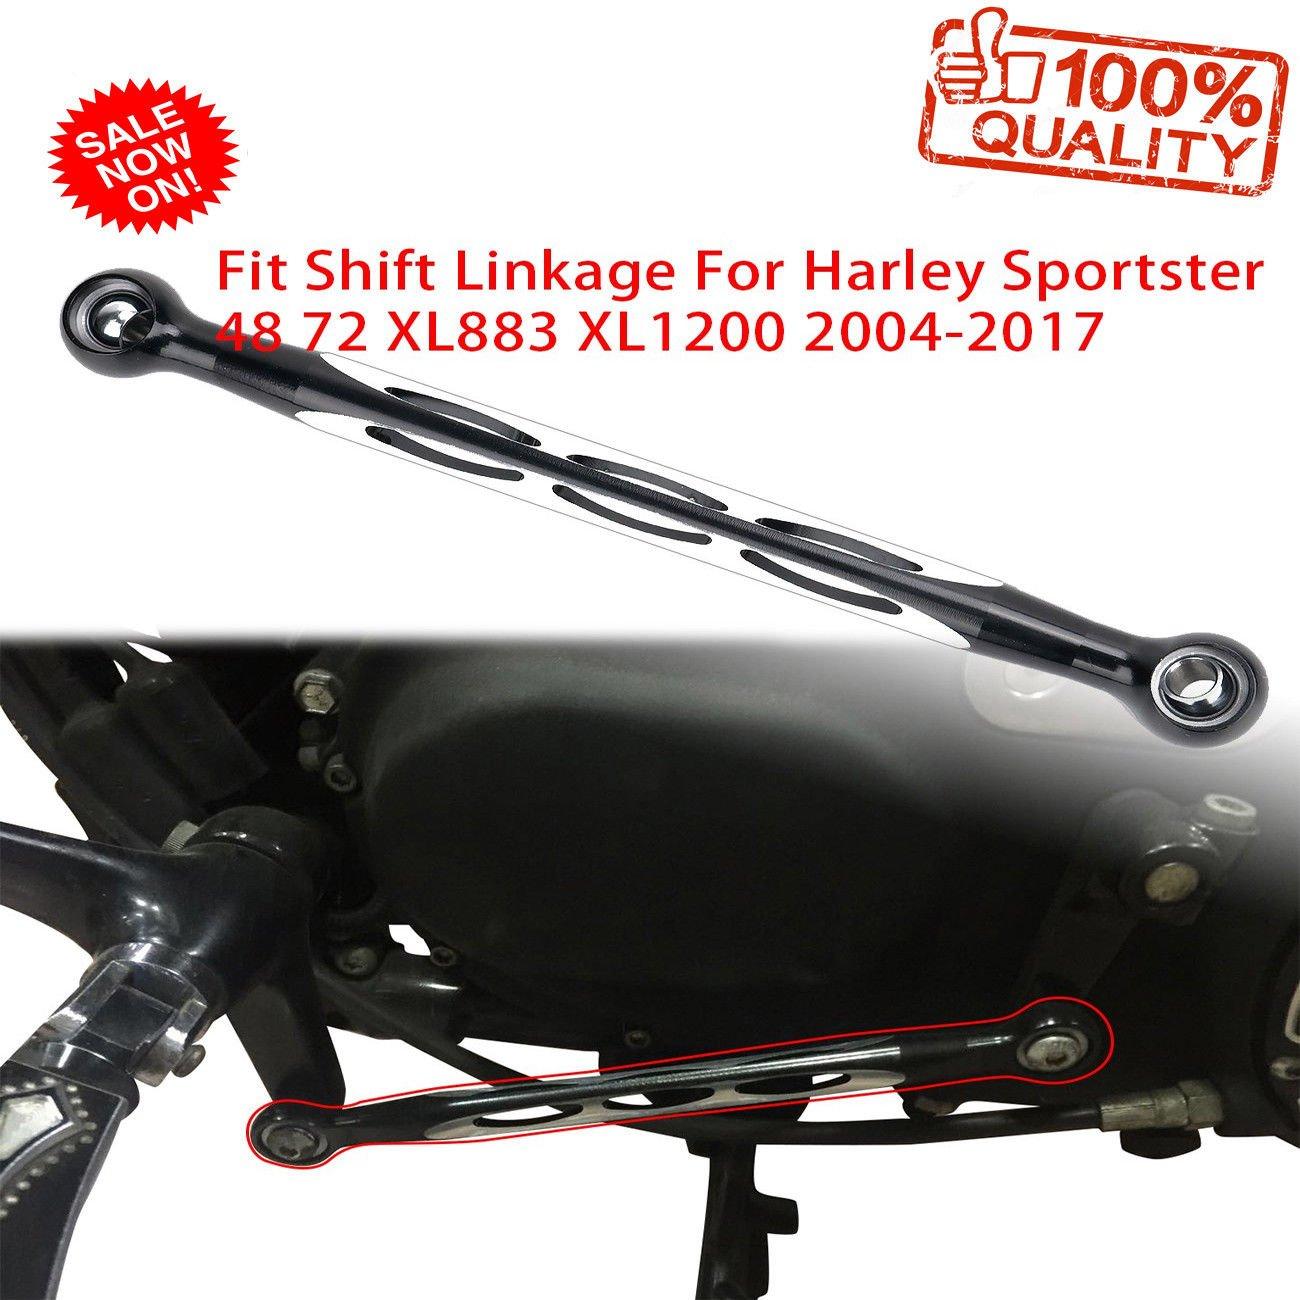 Gear Shift Linkage For Harley Sportster 48 72 XL883 XL1200 2004-2017 BOXWELOVE